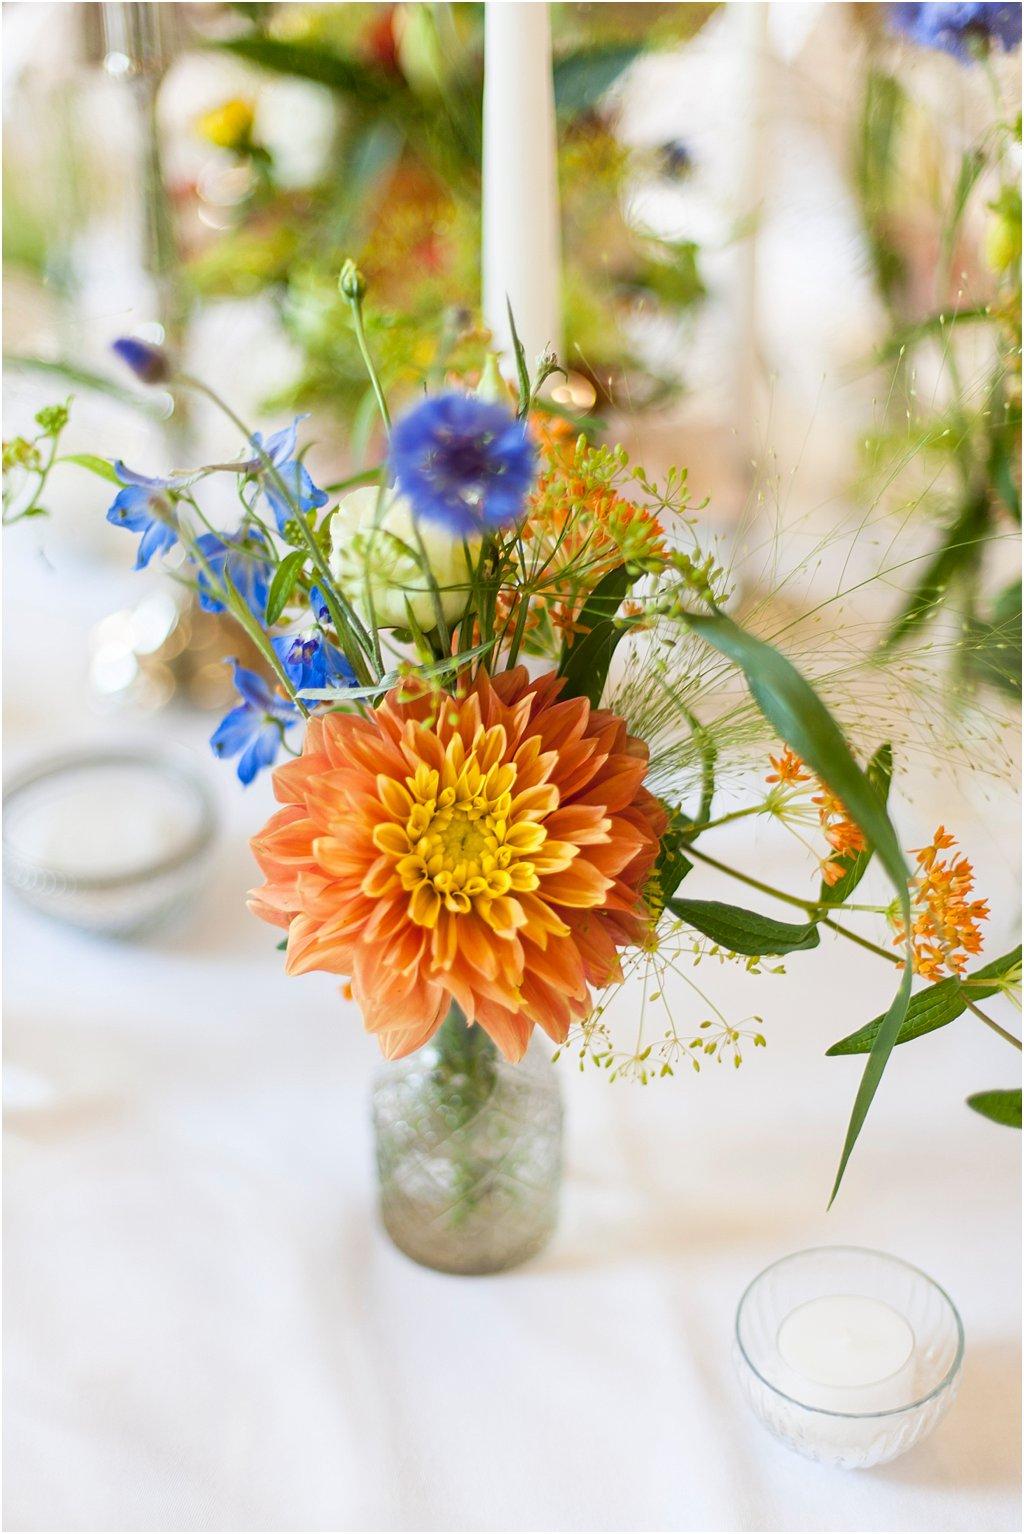 Blumen Folklore bunt